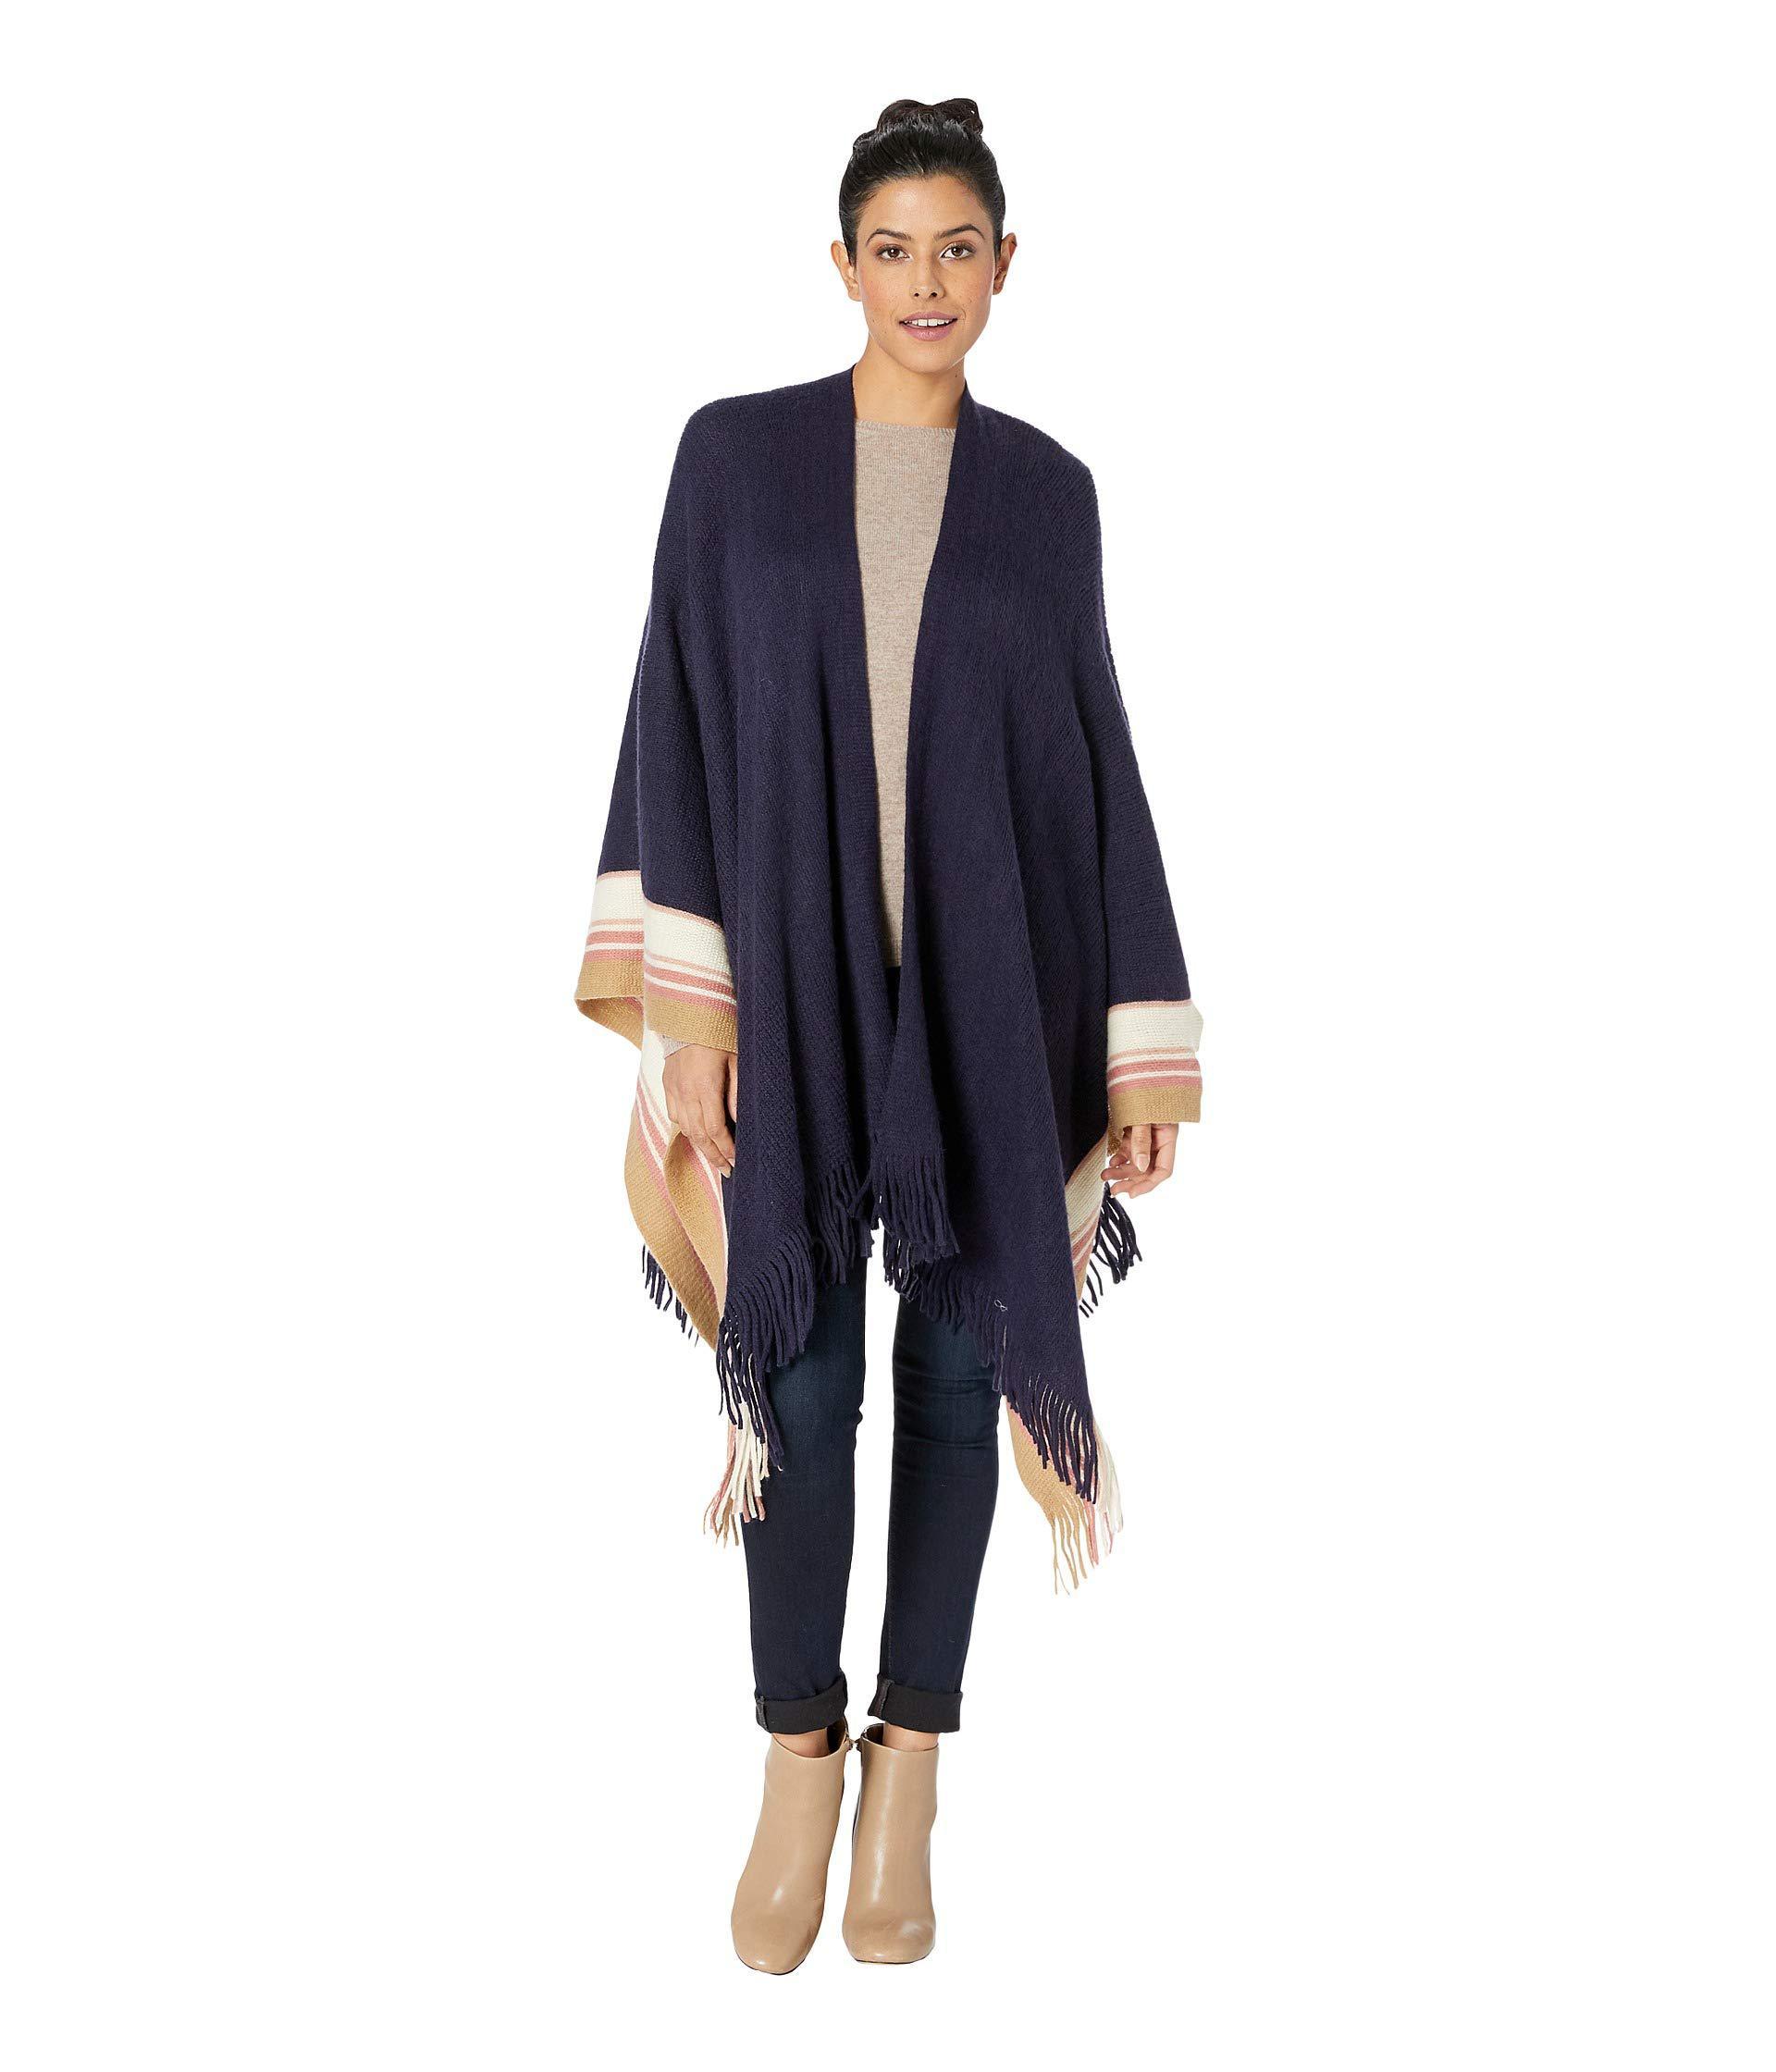 b1101197b8e41 Lyst - Vince Camuto Feels Like Stripes Ruana (navy) Women's Clothing ...